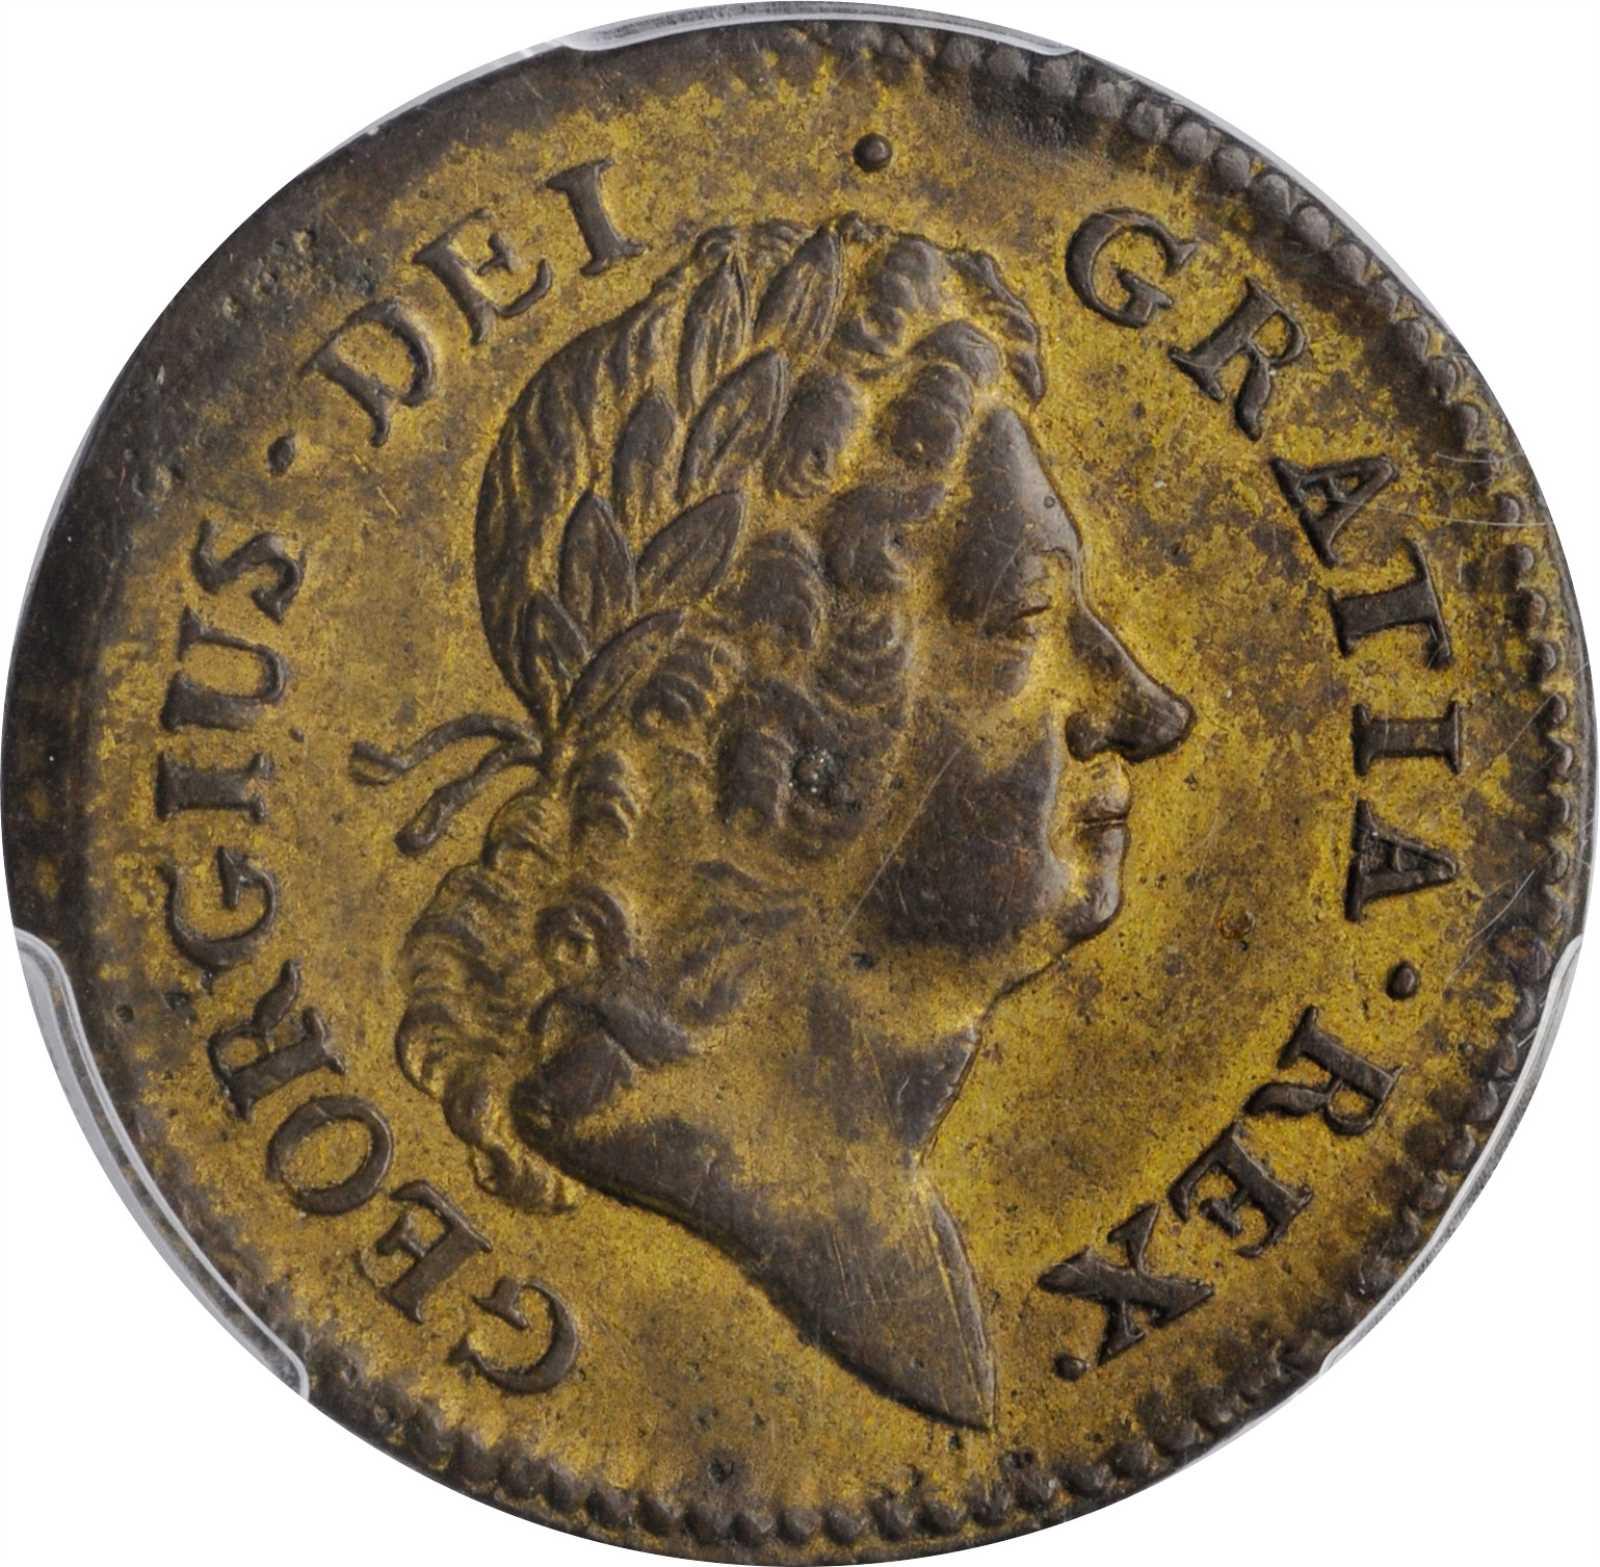 greysheet coins